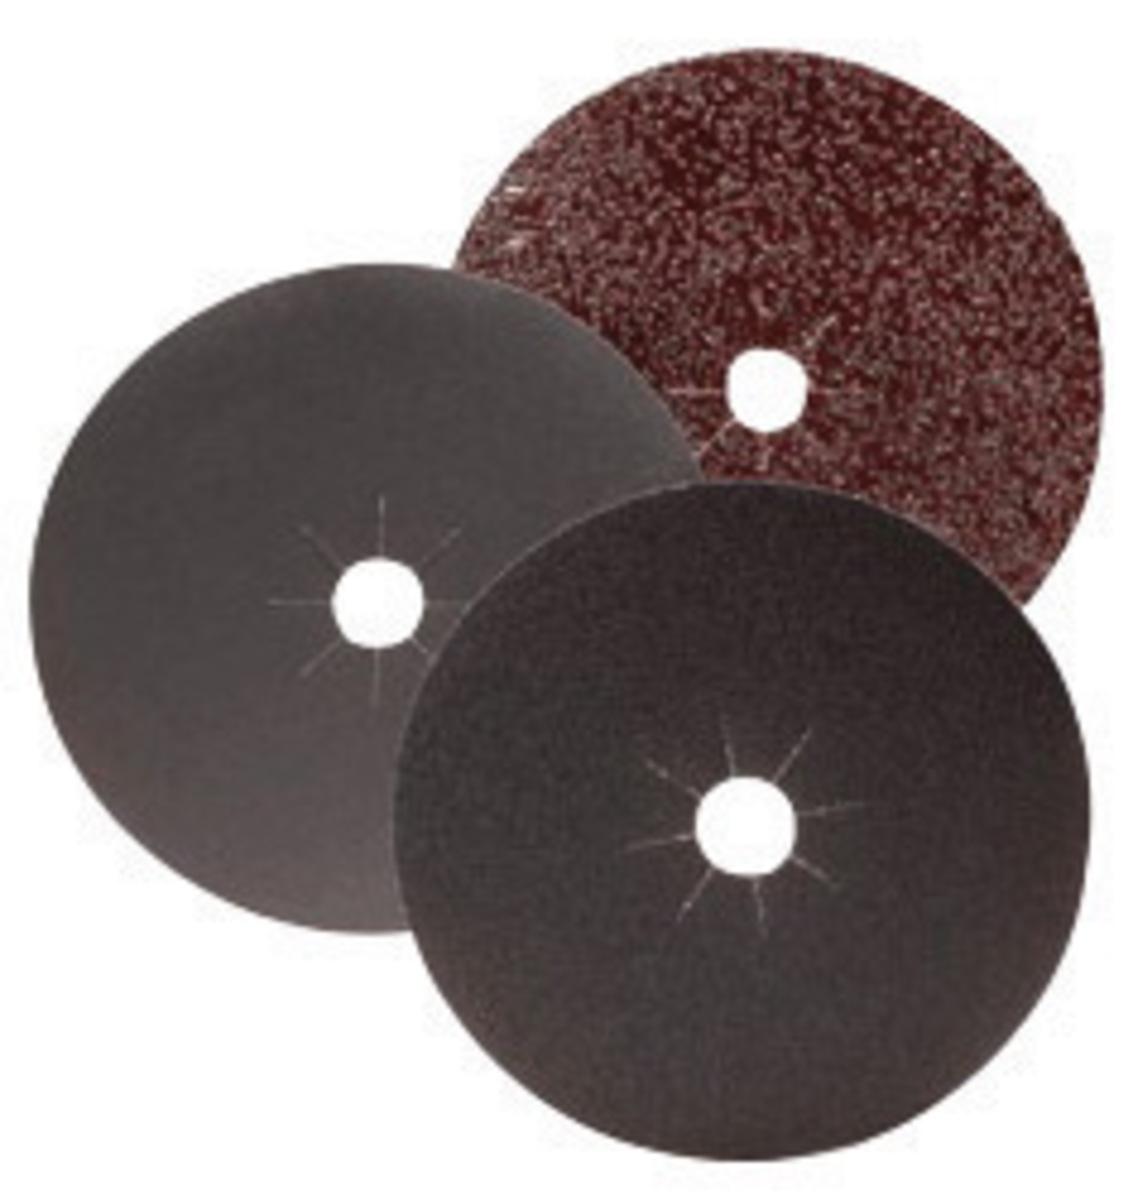 Airgas uab85116 united abrasives 17 x 2 36x grit for 17 floor sanding disc